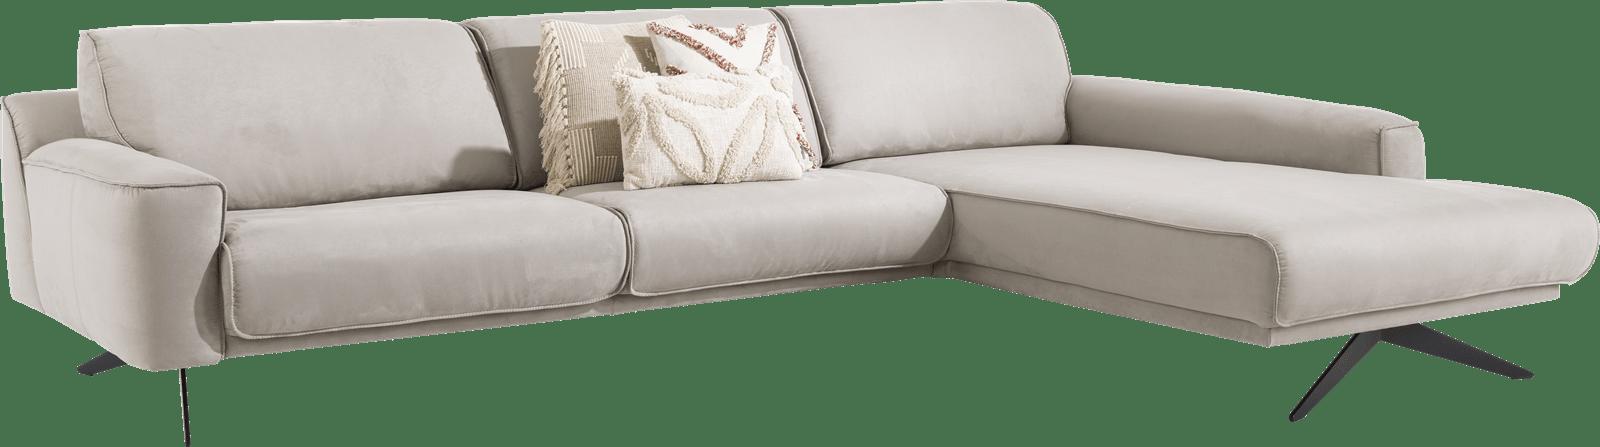 XOOON - Zilvano - Toutes les canapés - meridienne xxl - droit